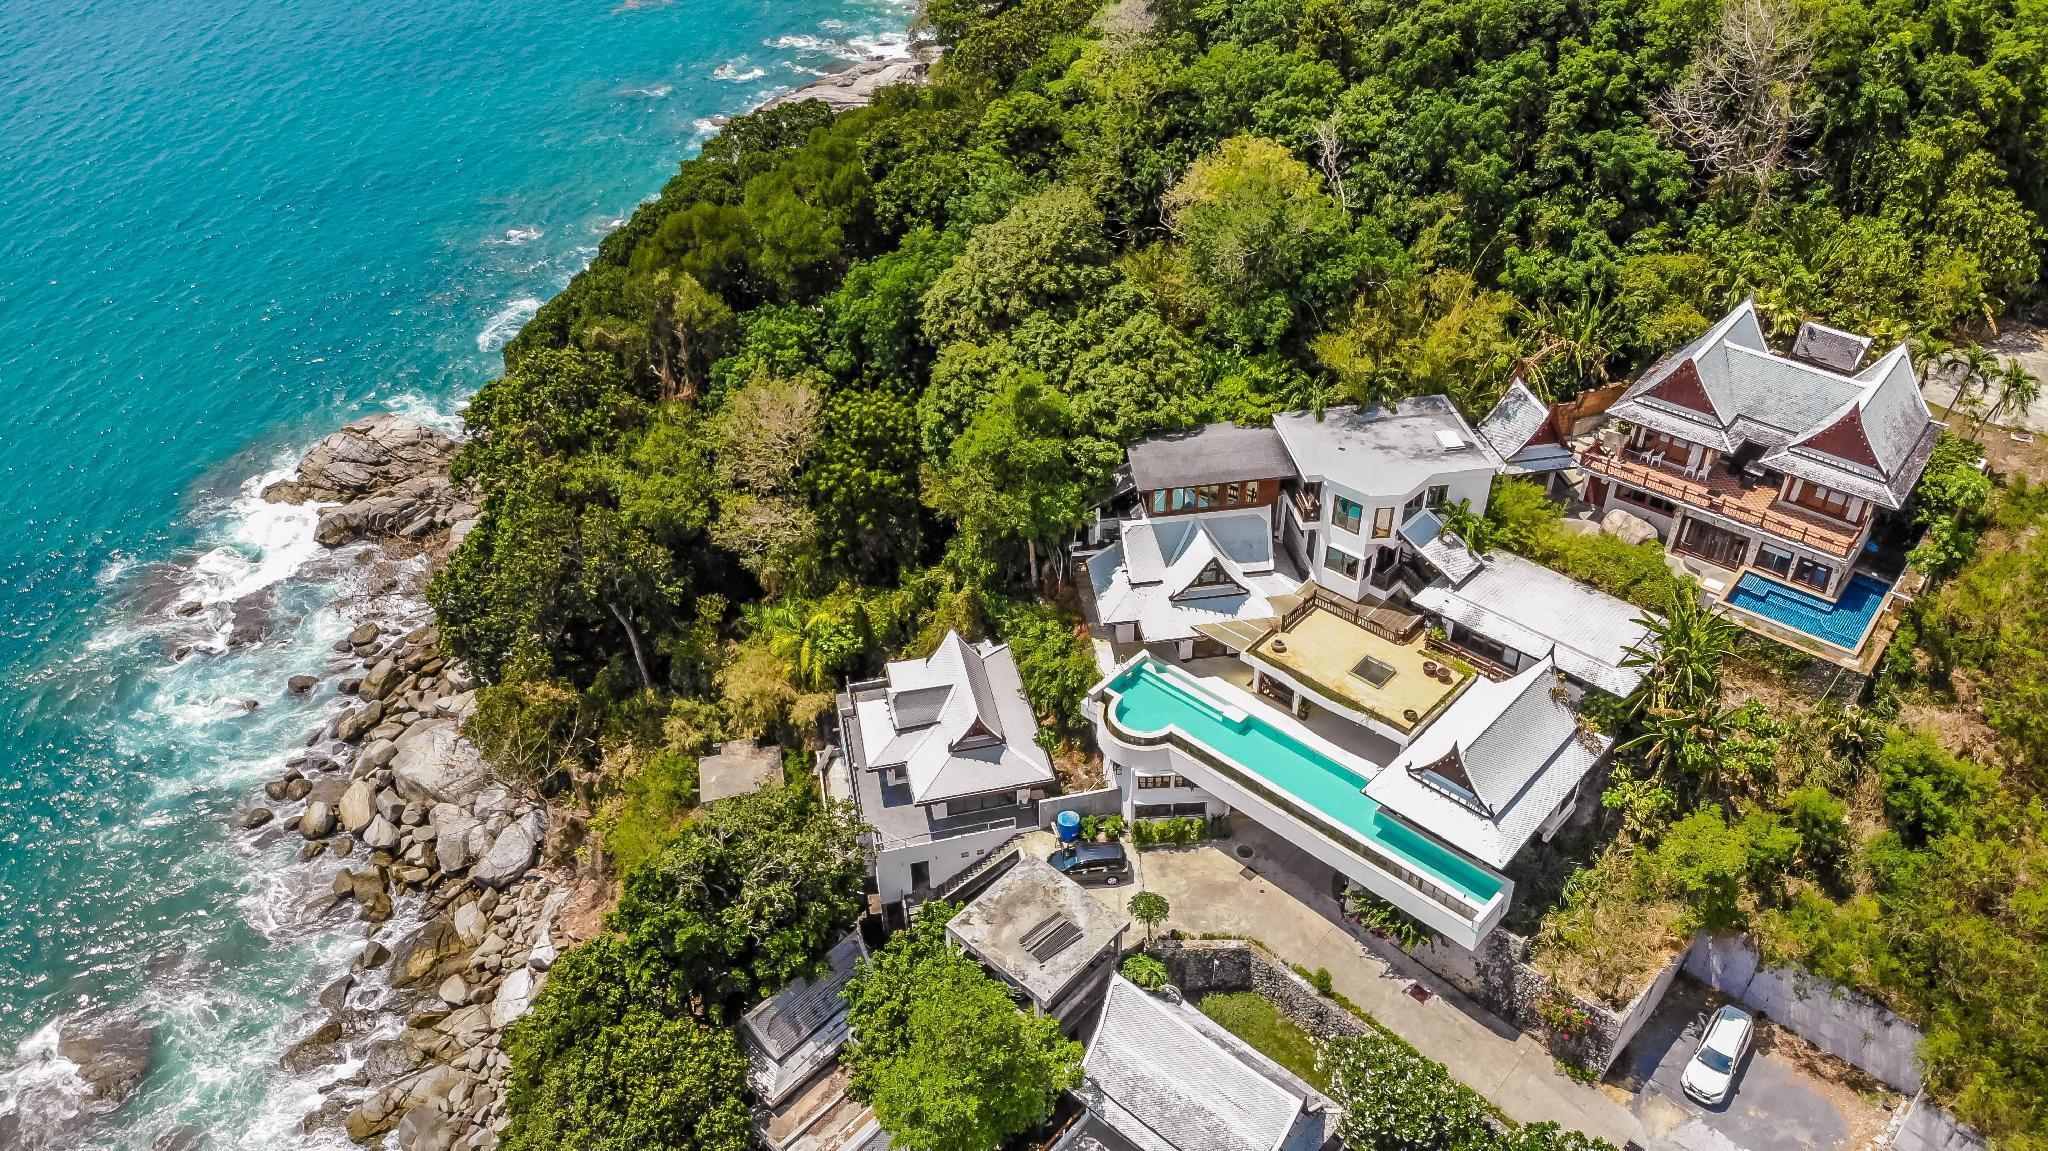 LUSTY Ocean View Villa in Kamala วิลลา 6 ห้องนอน 6 ห้องน้ำส่วนตัว ขนาด 350 ตร.ม. – สุรินทร์